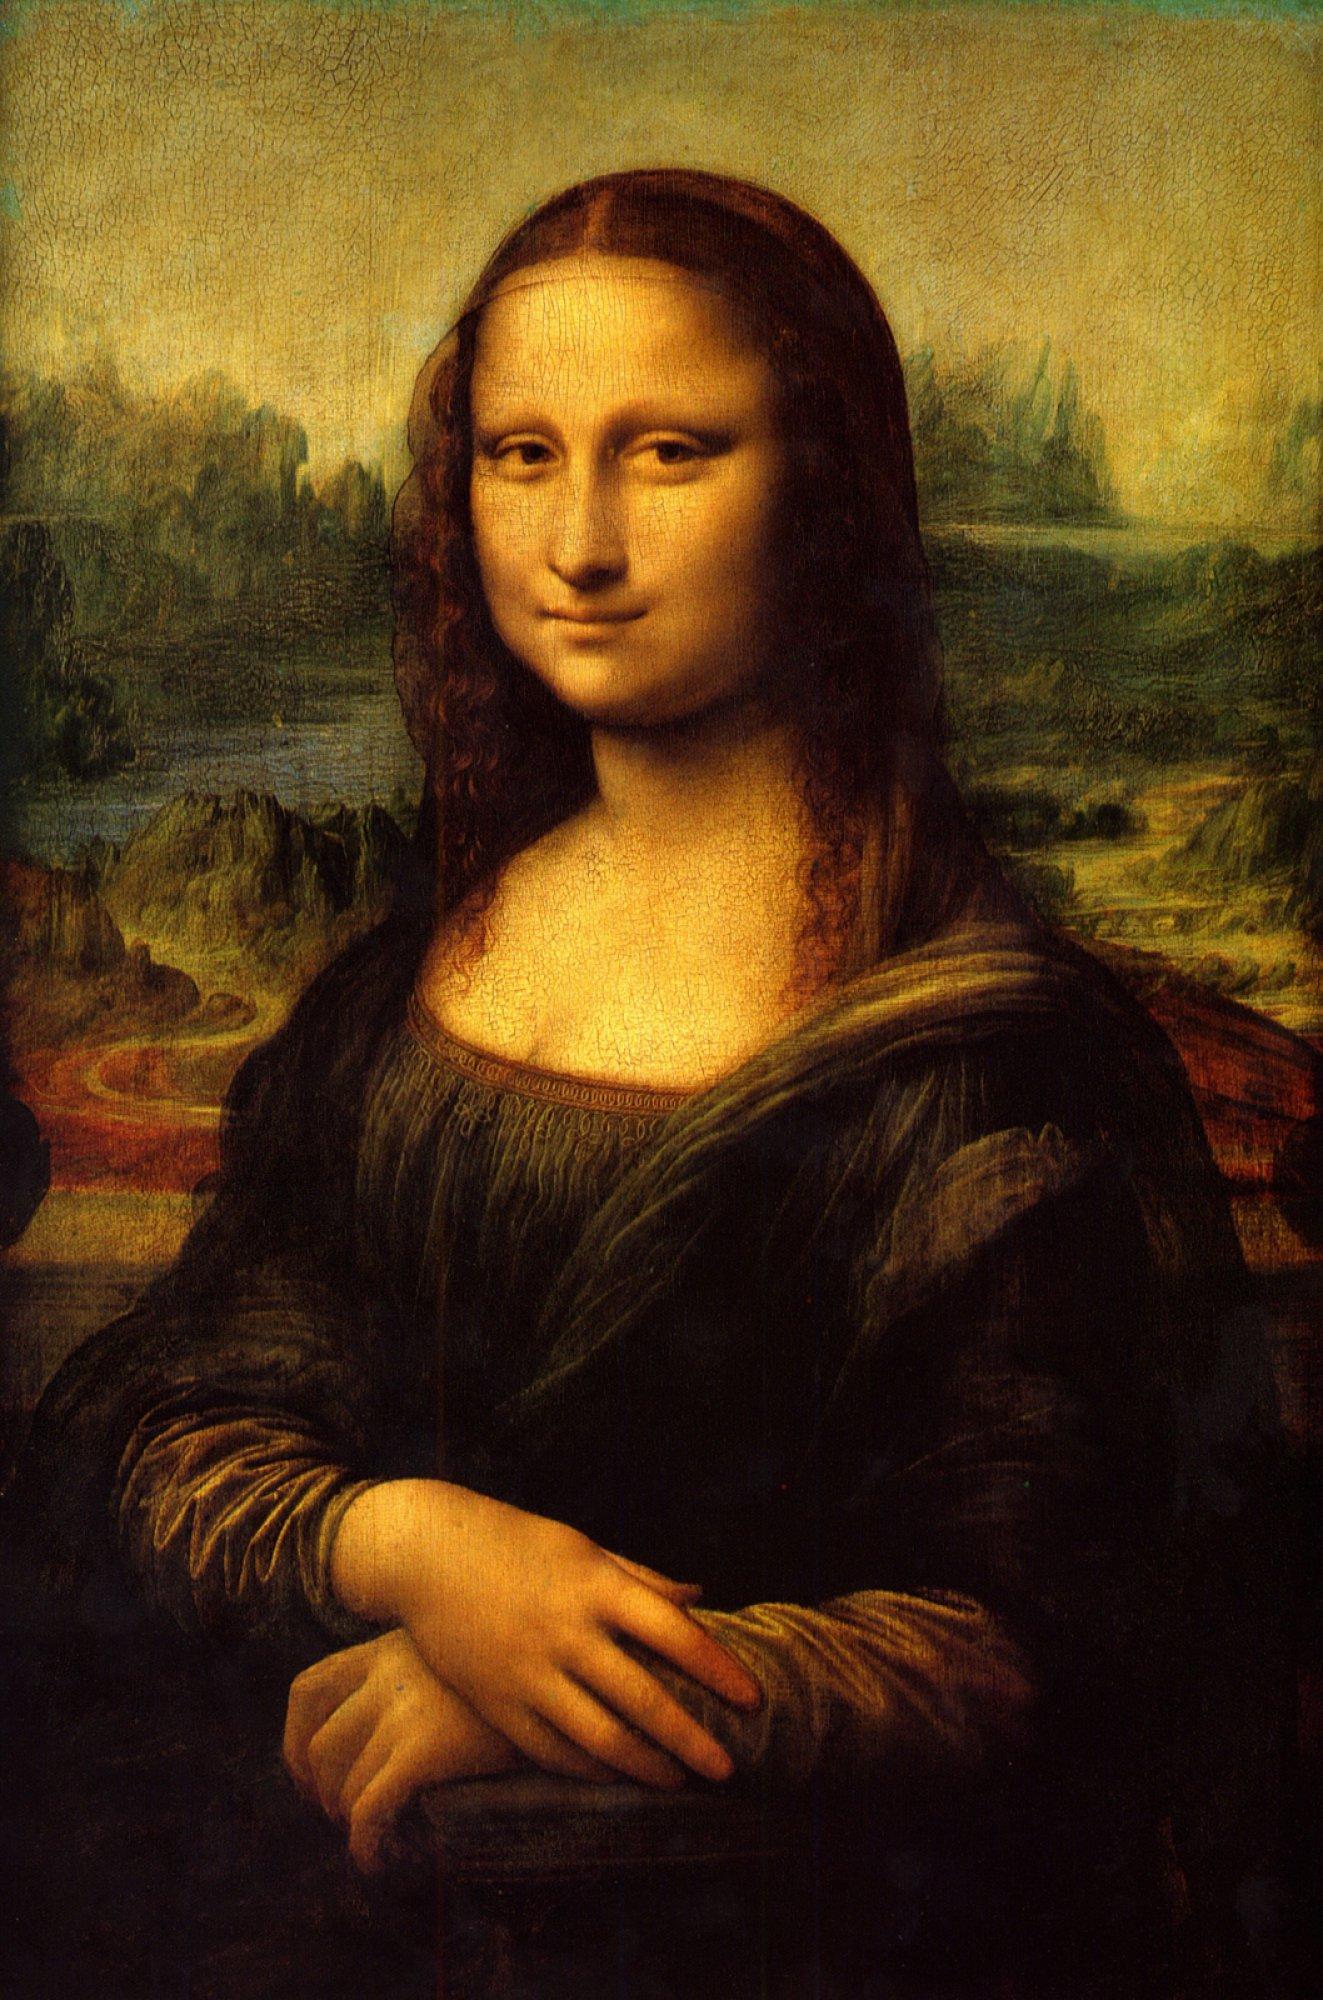 https://bubo.sk/uploads/galleries/5048/pariz-wikipedia-mona-lisa.jpg